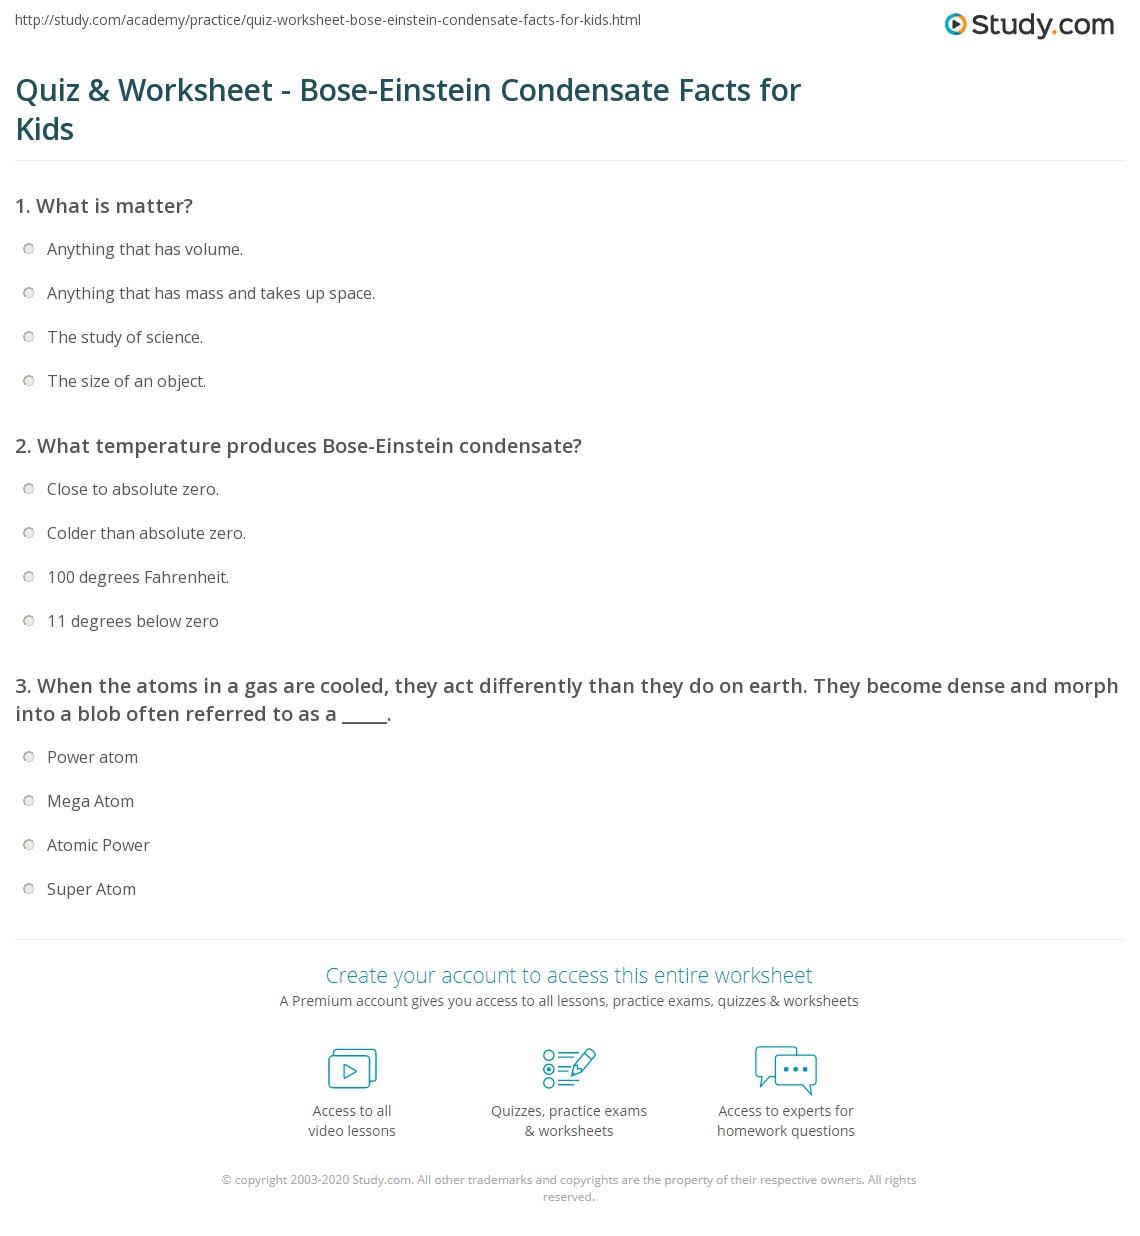 Free Worksheet Global Wind Patterns Worksheet coriolis effect worksheet global wind patterns ocean surface cur questions